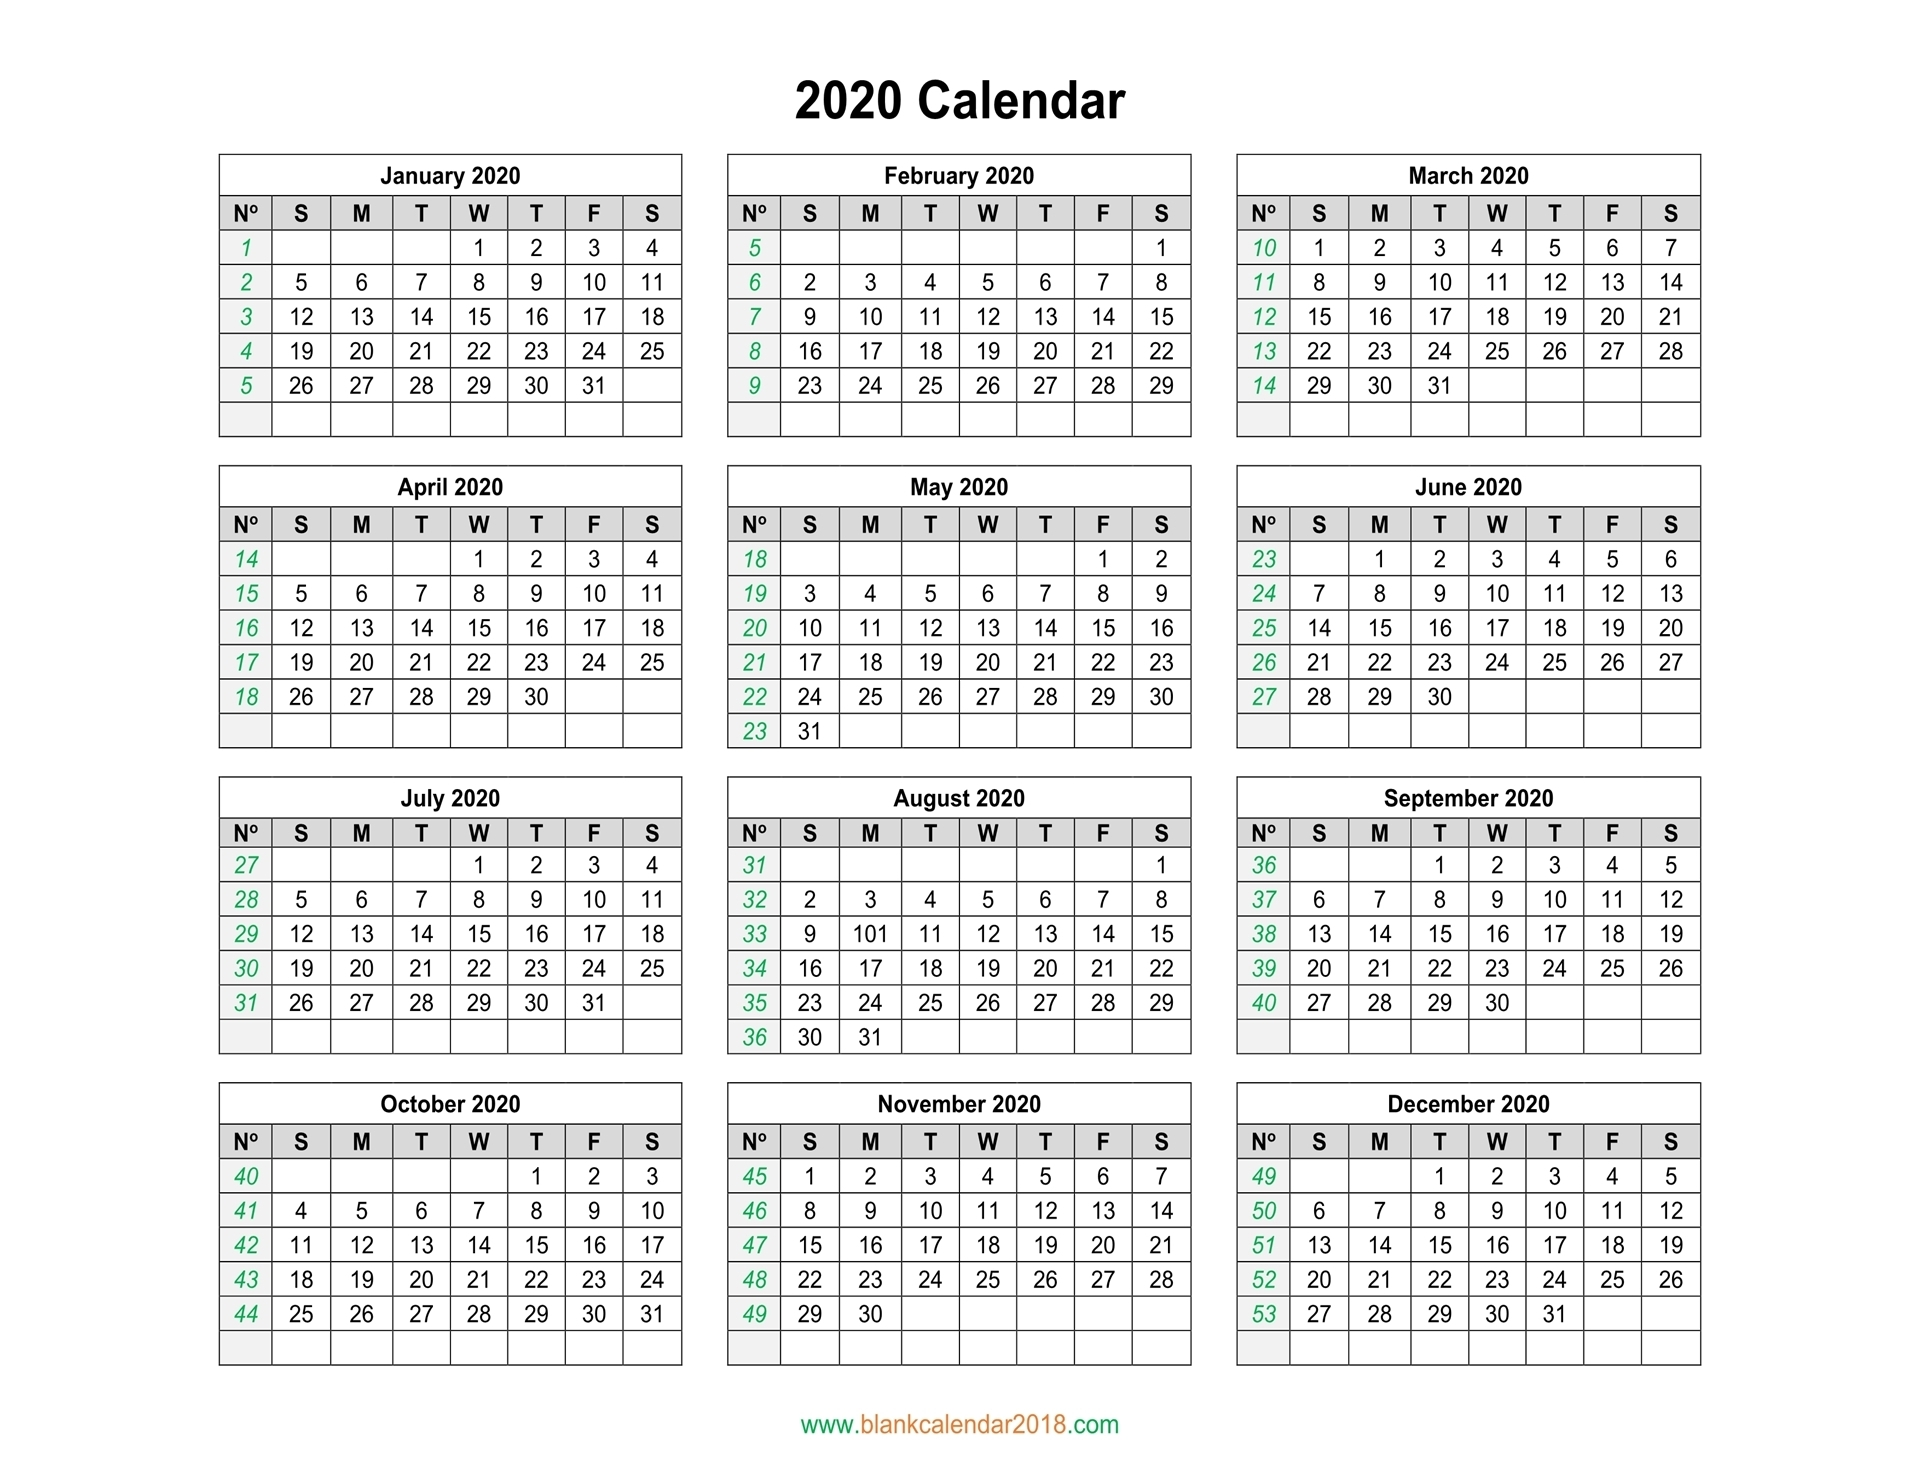 Blank Calendar 2020 inside Printable Fillable 2020 Calandars Monthly At A Glance